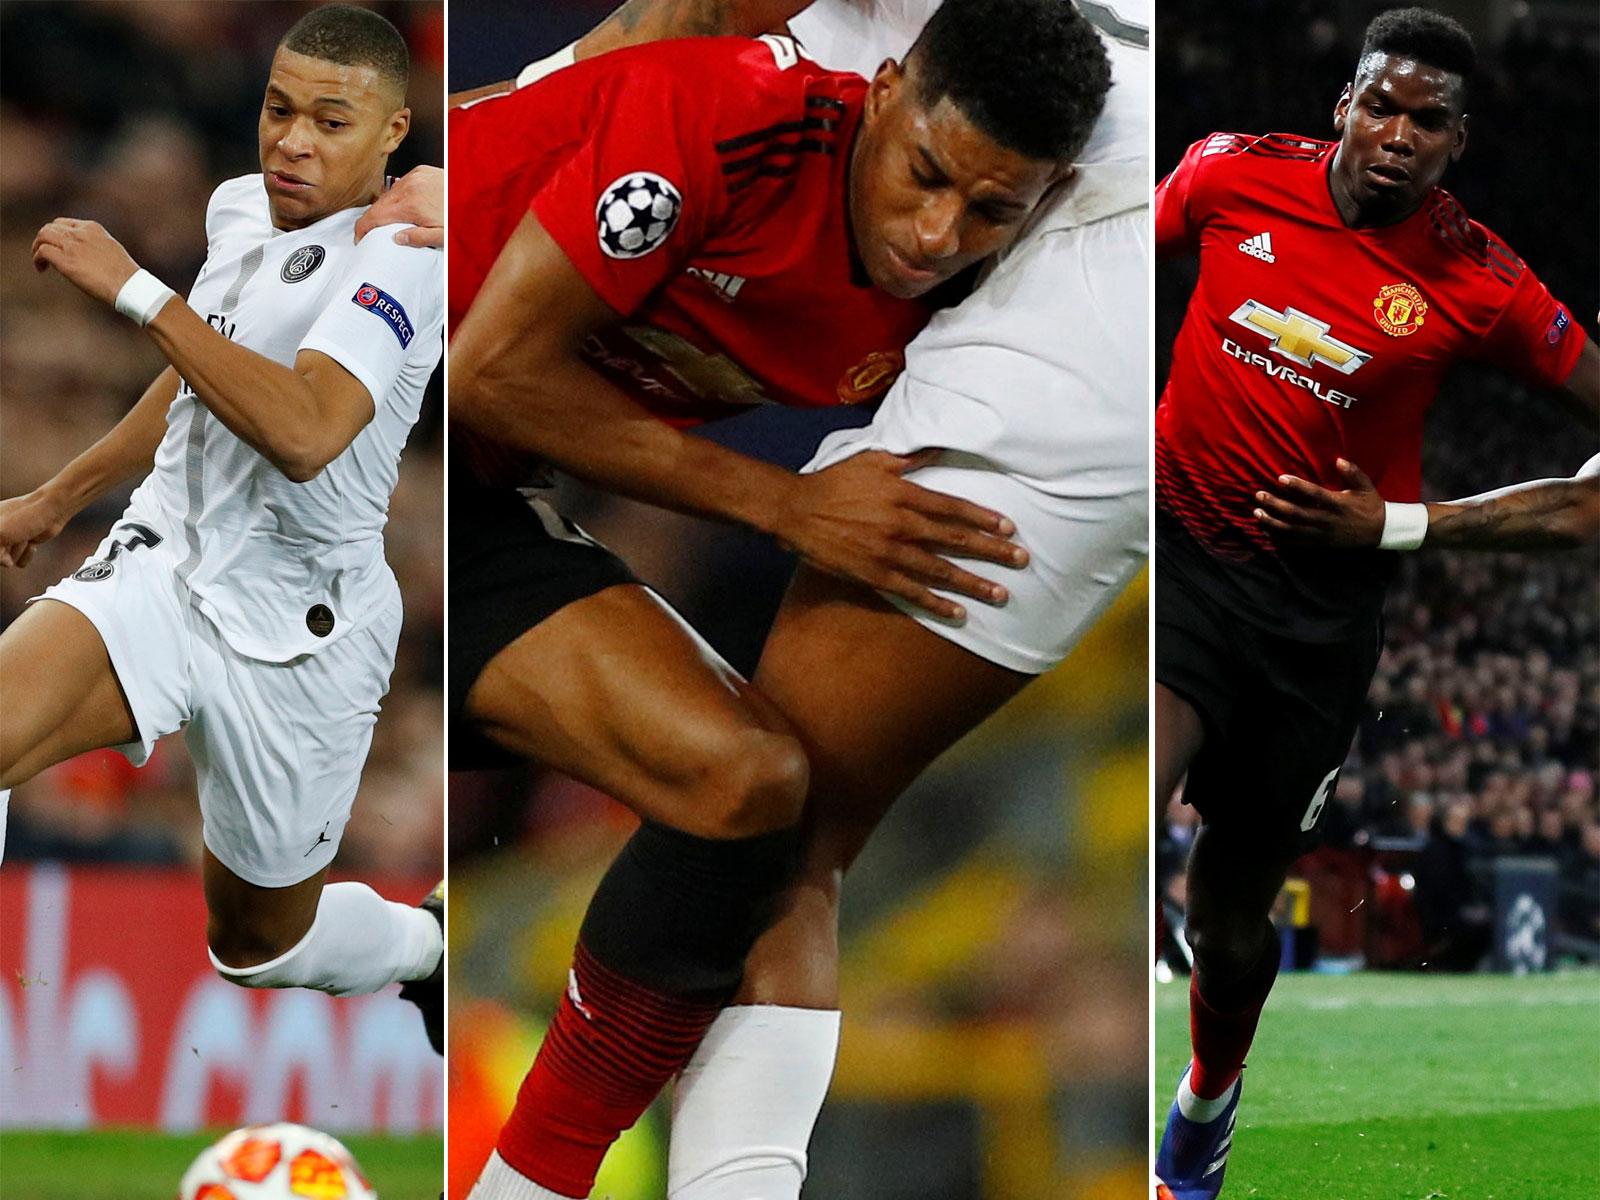 United---PSG